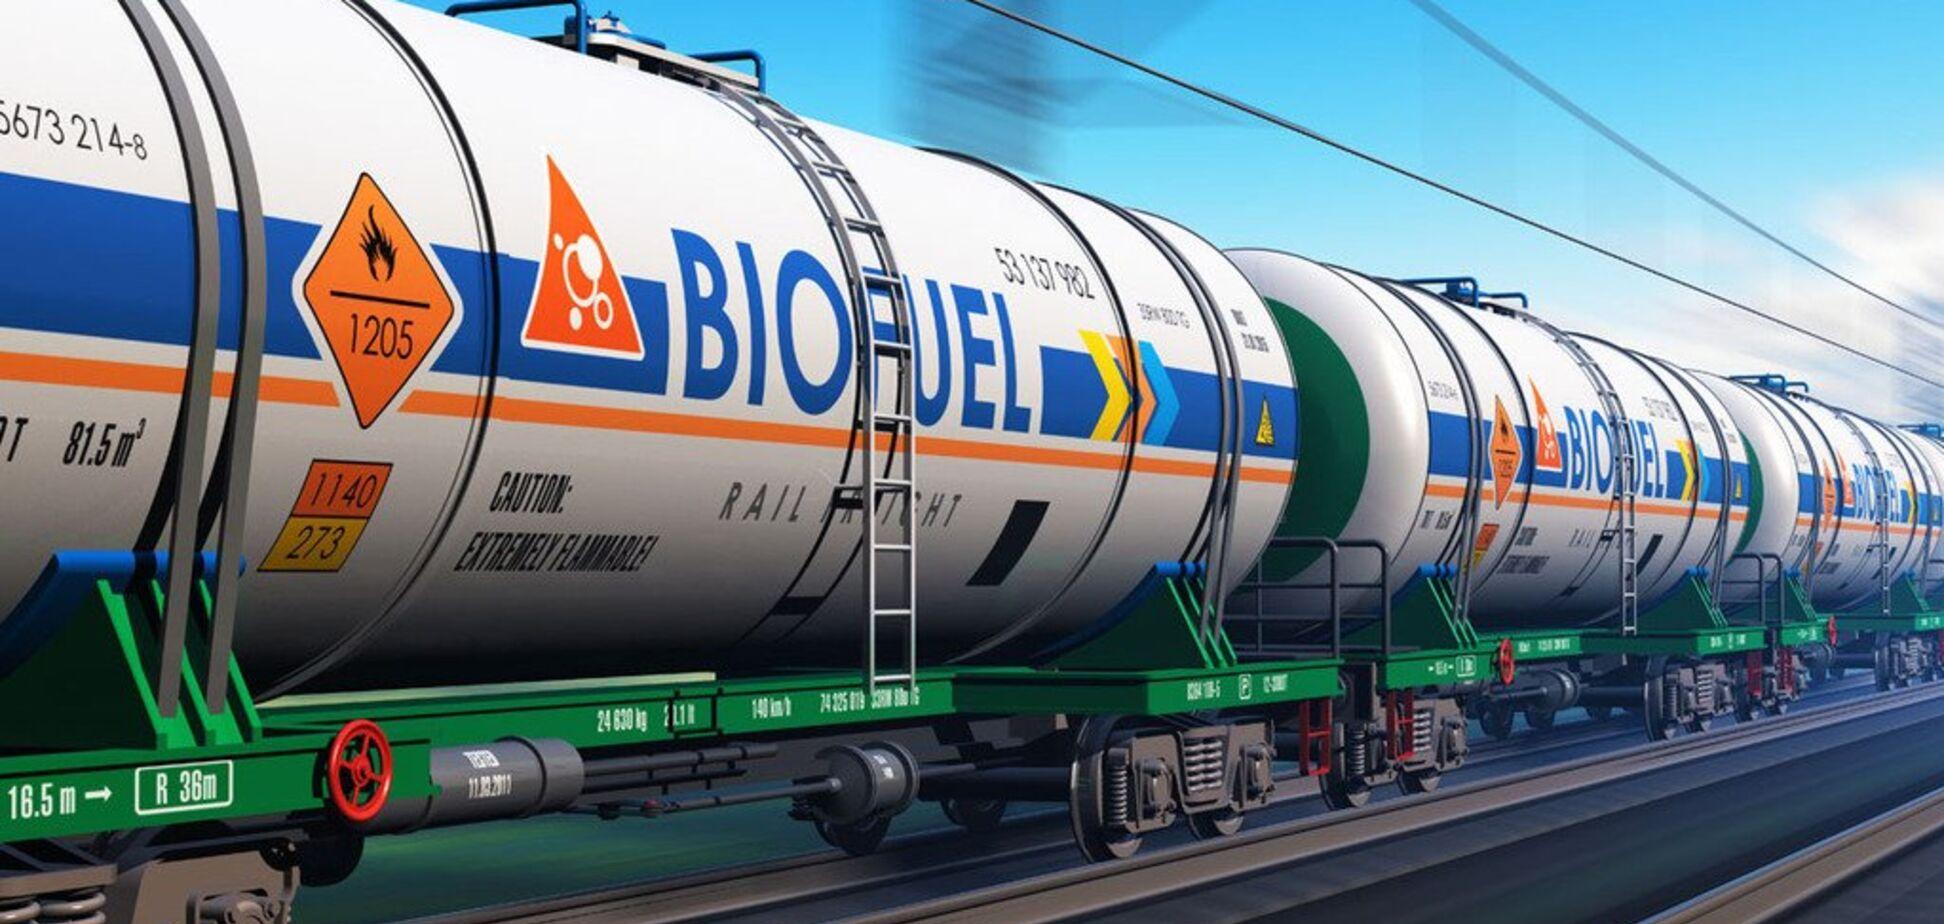 Европа откажется от газа: стало известно, чем заменят